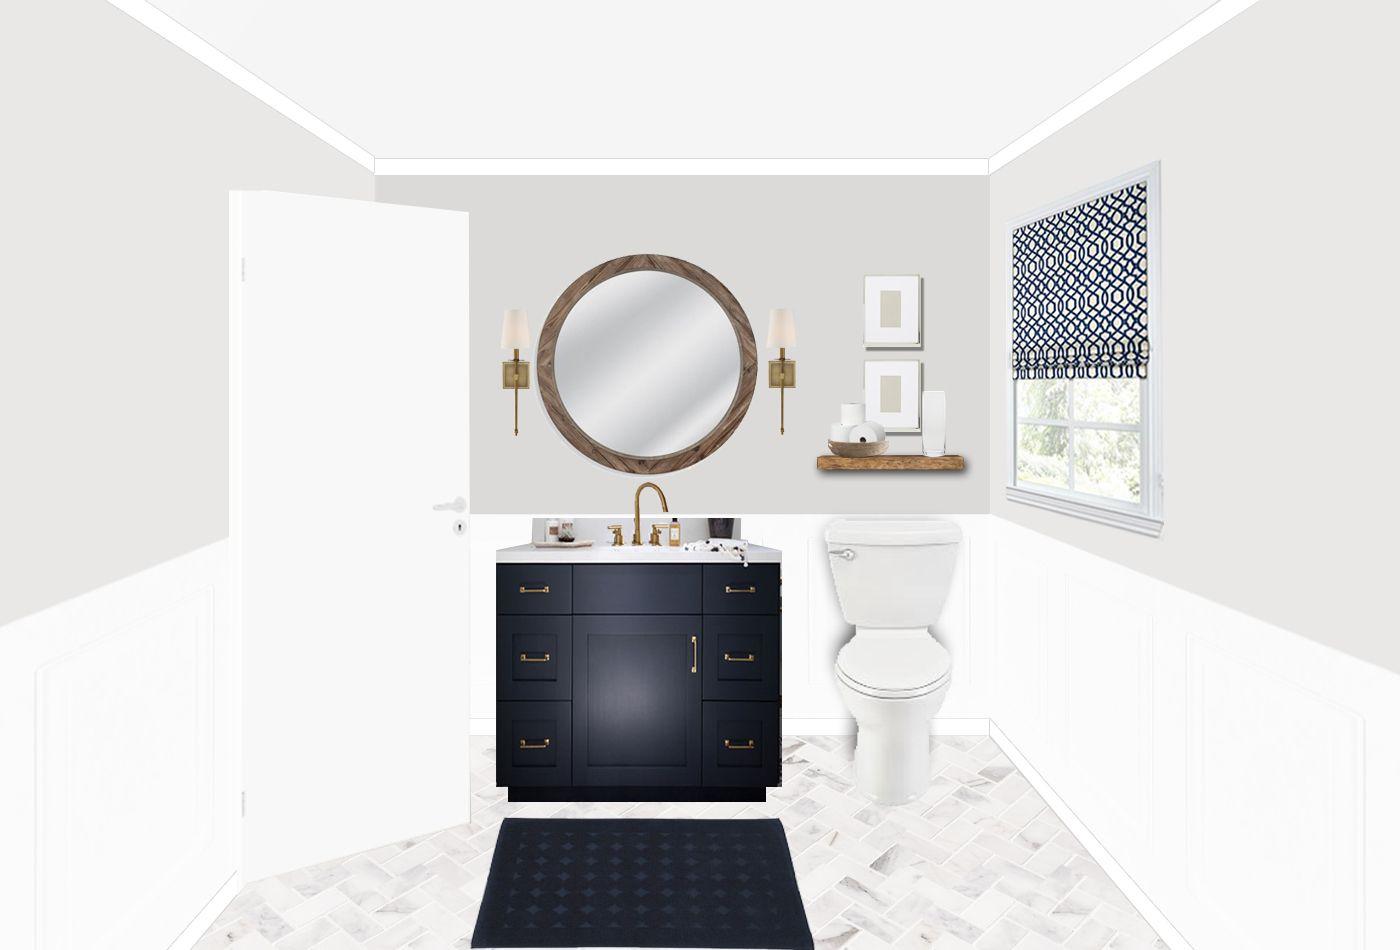 Transitional Bathroom Design With Navy Vanity Gold Hardware Round Wood Mirror Herringb Transitional Bathroom Design Bathroom Interior Design Bathroom Design